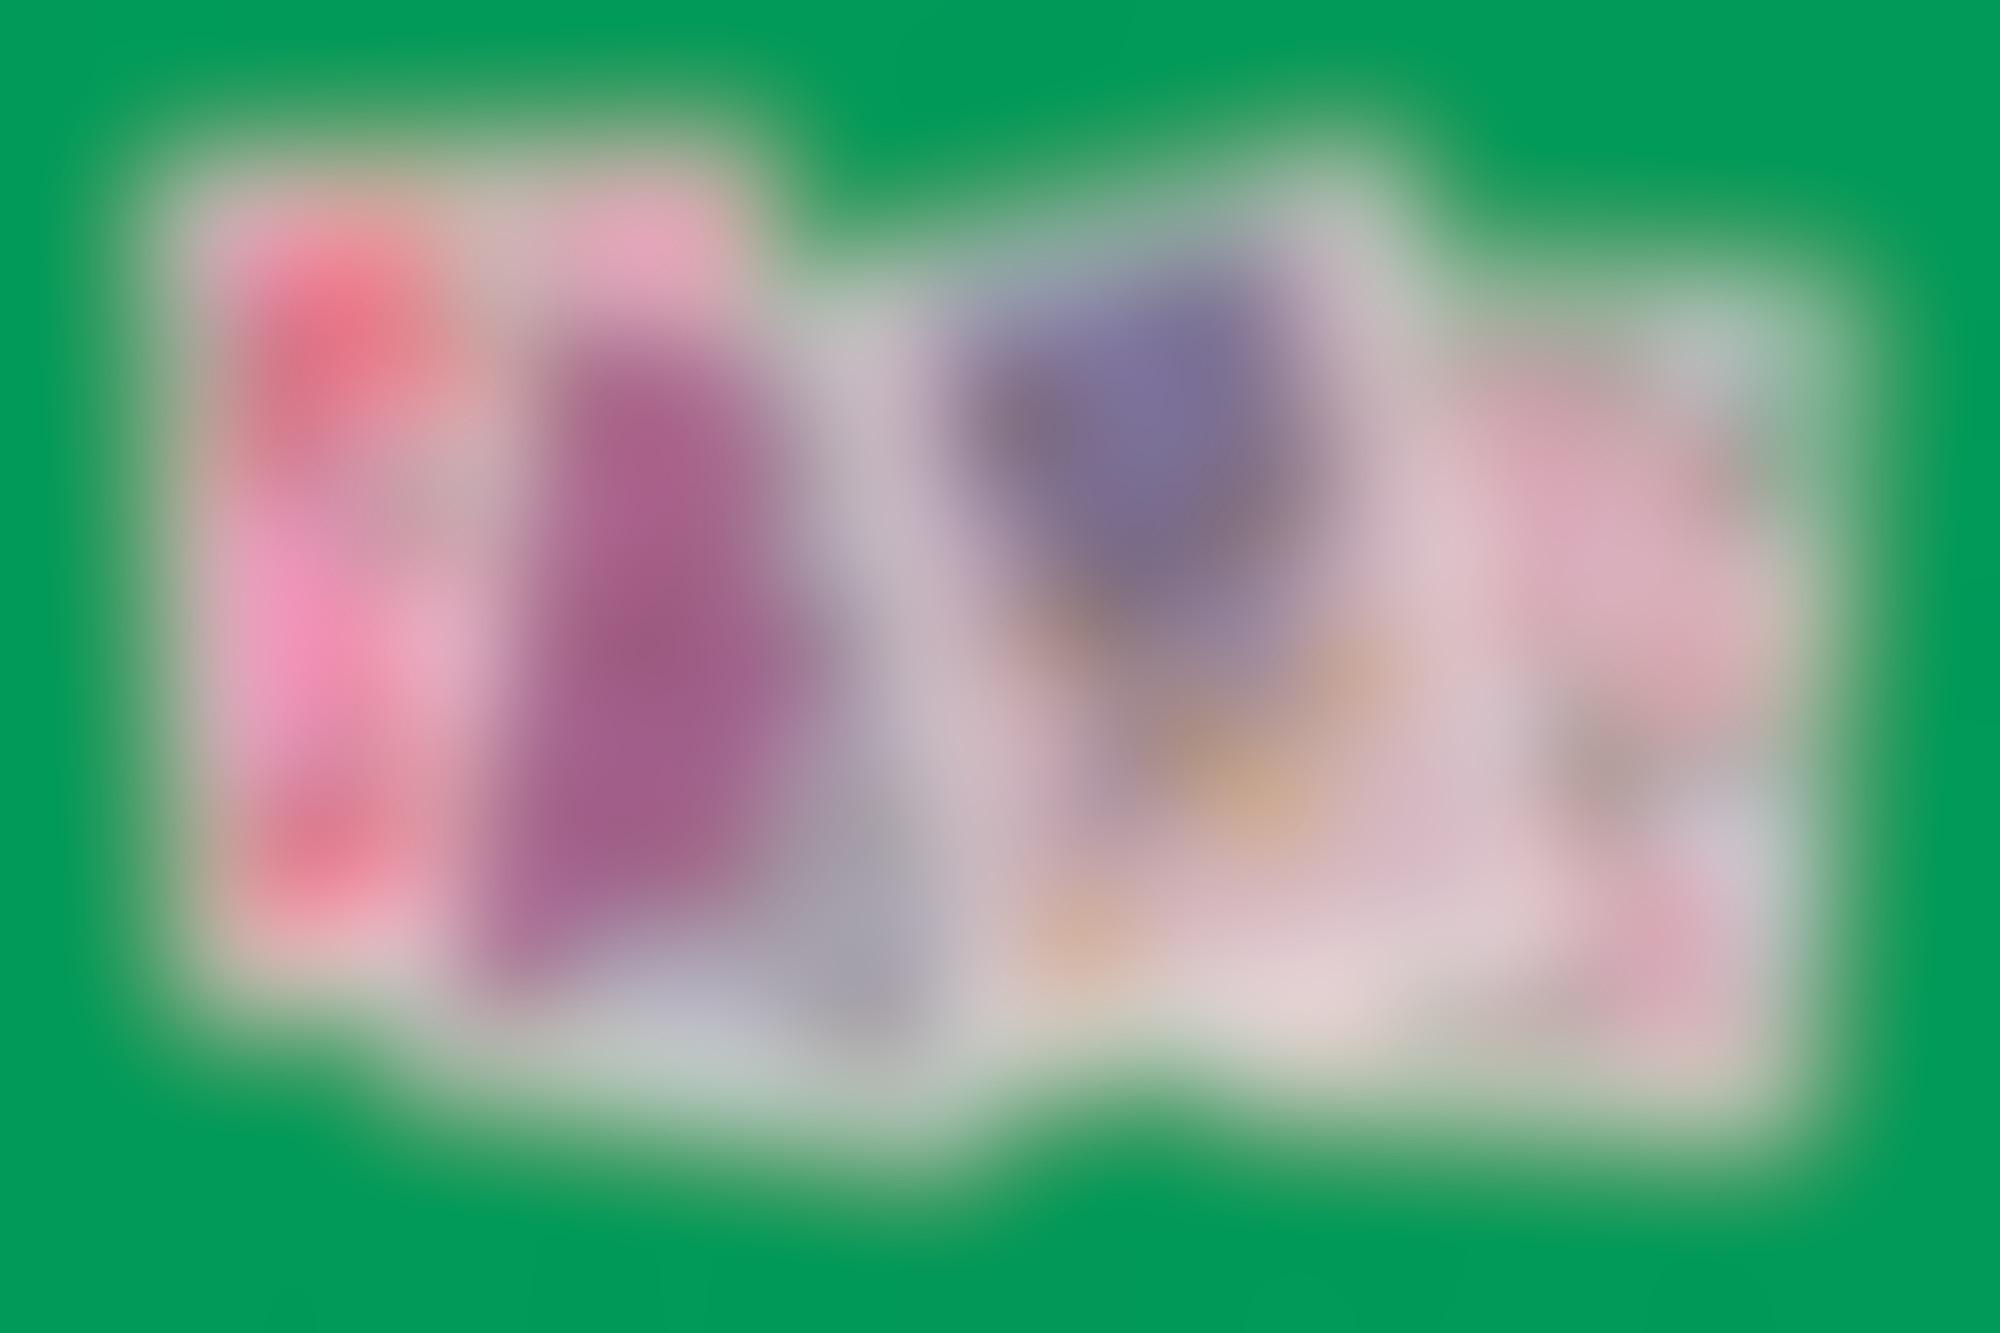 RISOTTO Calendar Collevcion A3 Editioned Prints autocompressfitresizeixlibphp 1 1 0max h2000max w3 D2000q80s0c8934a7c6cc90fd0d528fcebf760c72